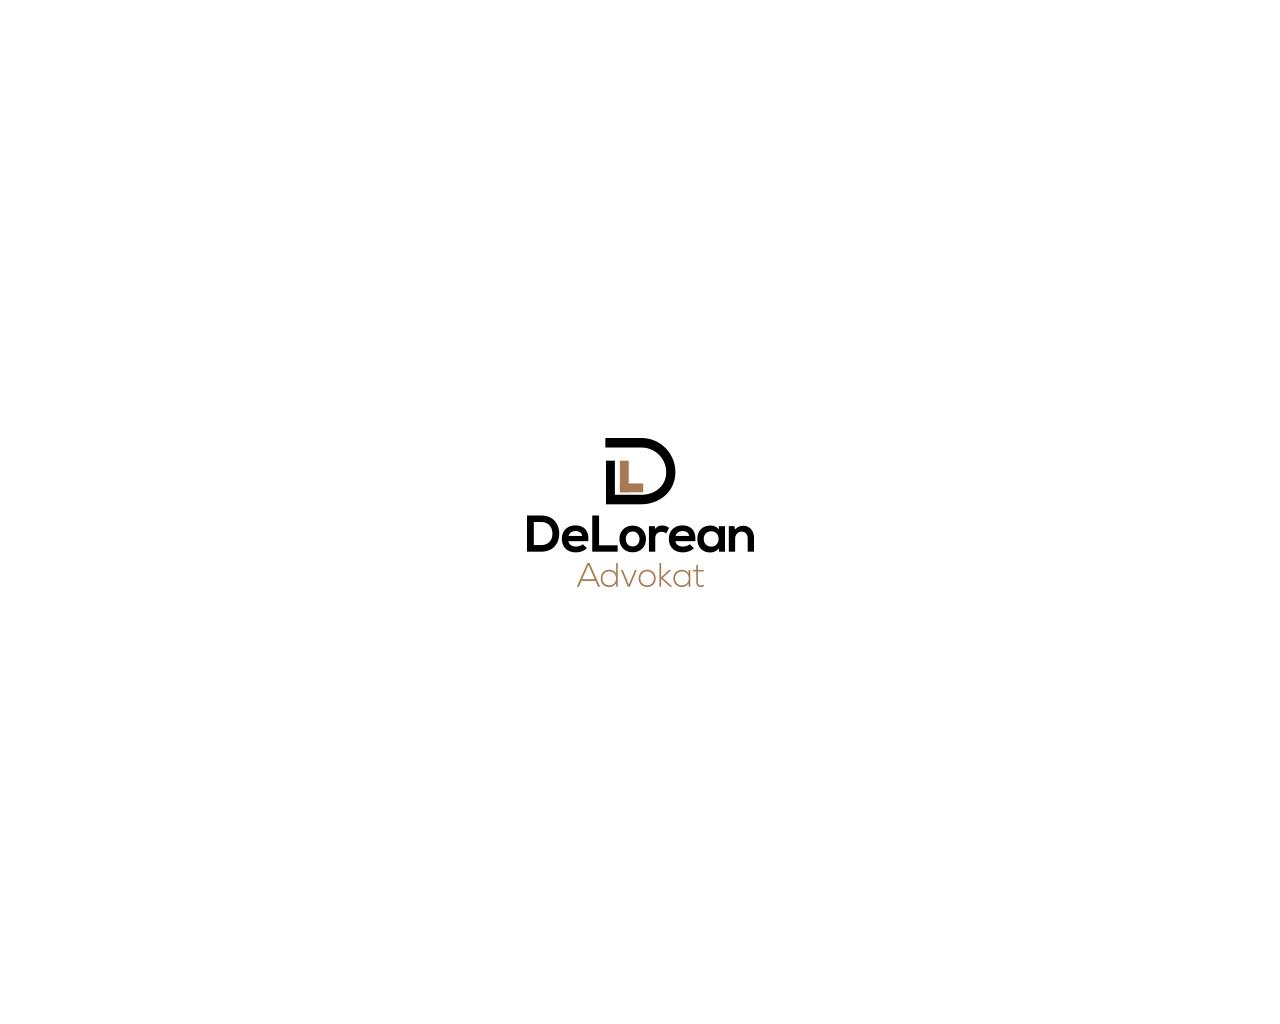 e6e1b217 Logo Design by damakyjr for DeLorean Advokat AB | Design #15688914